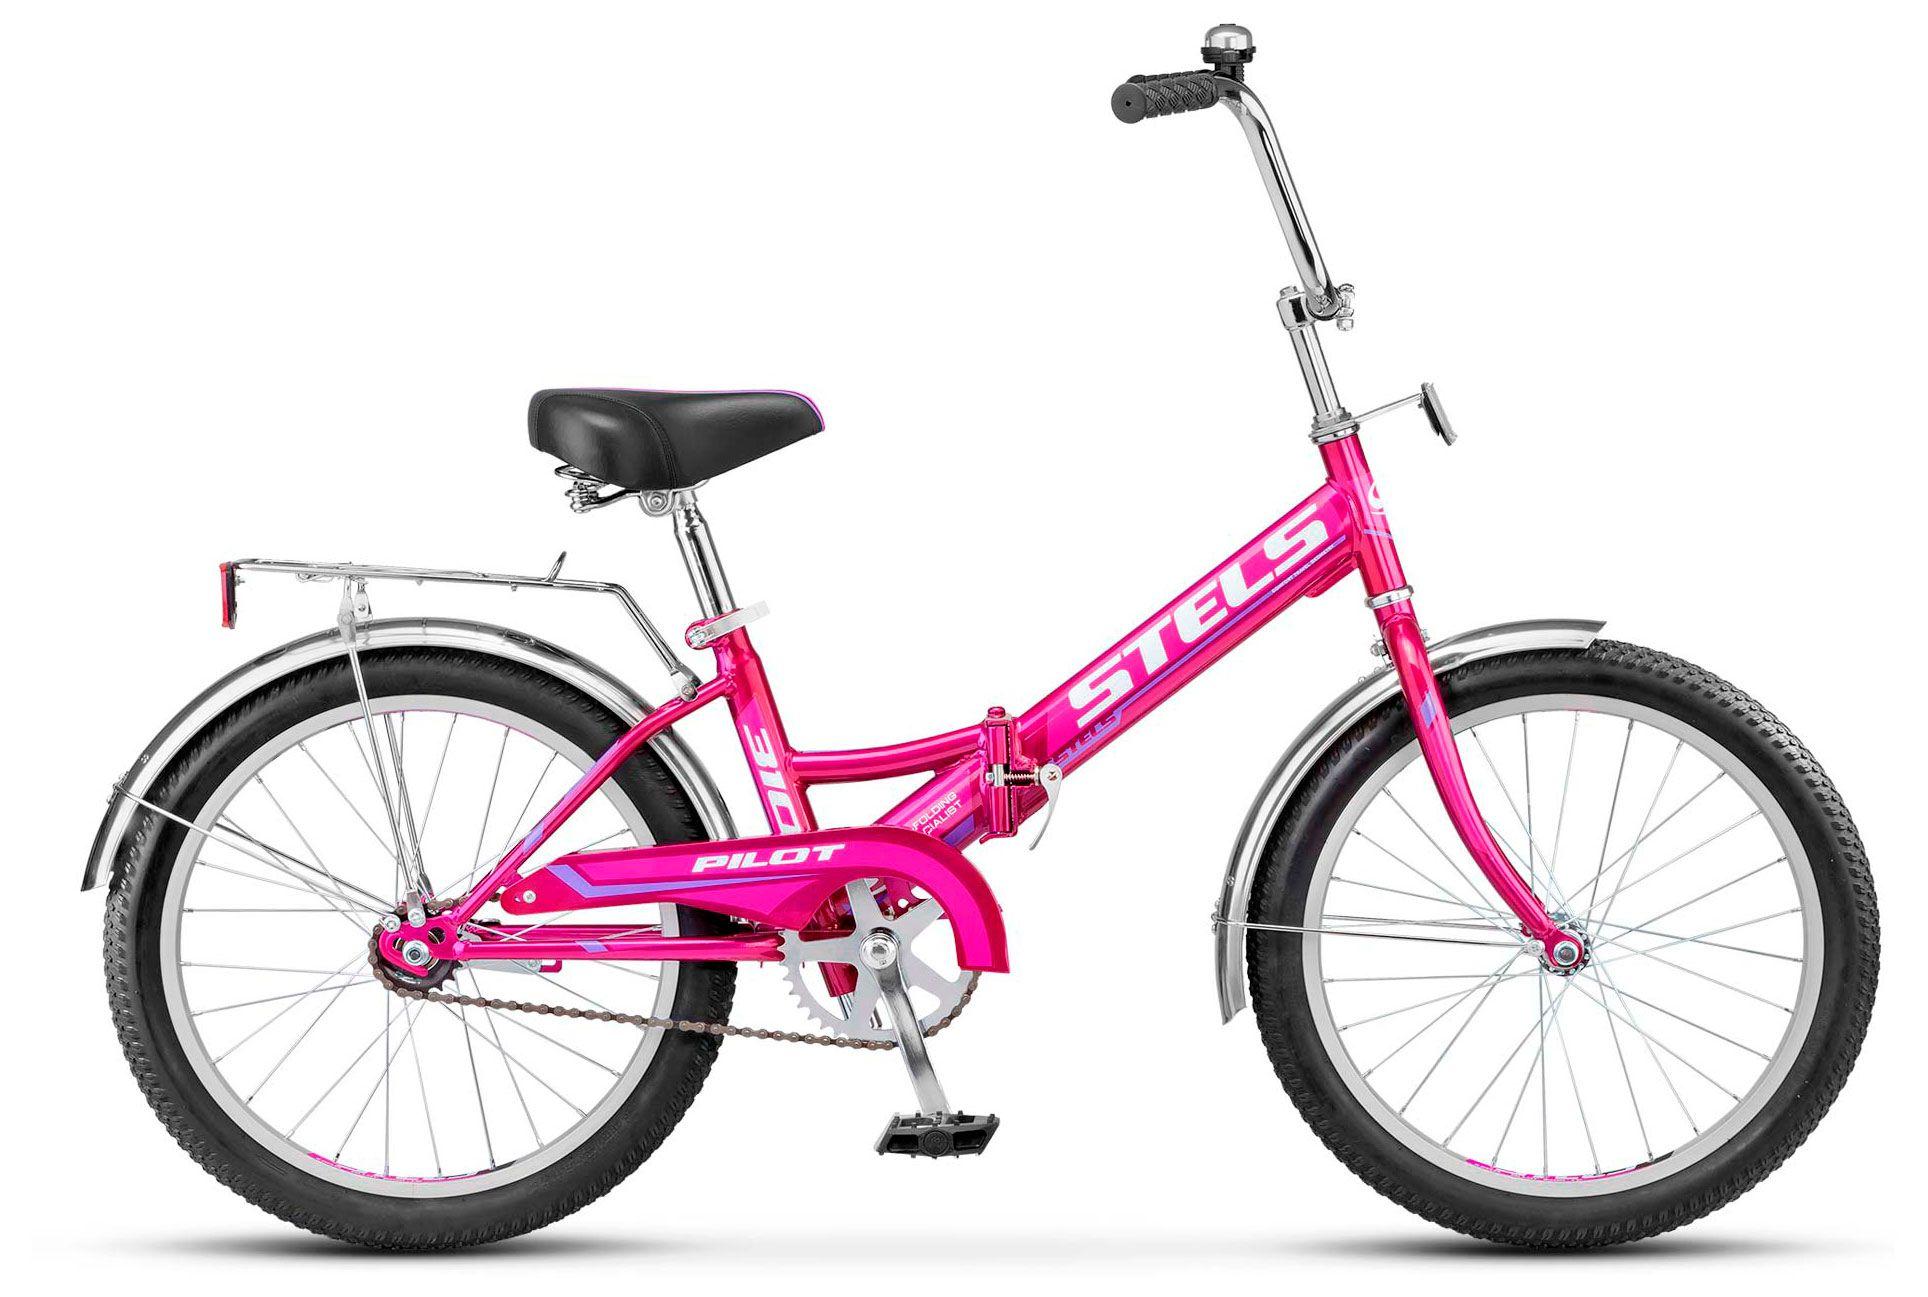 STELS Велосипед Pilot-310 20» (13» Малиновый), арт. Z011